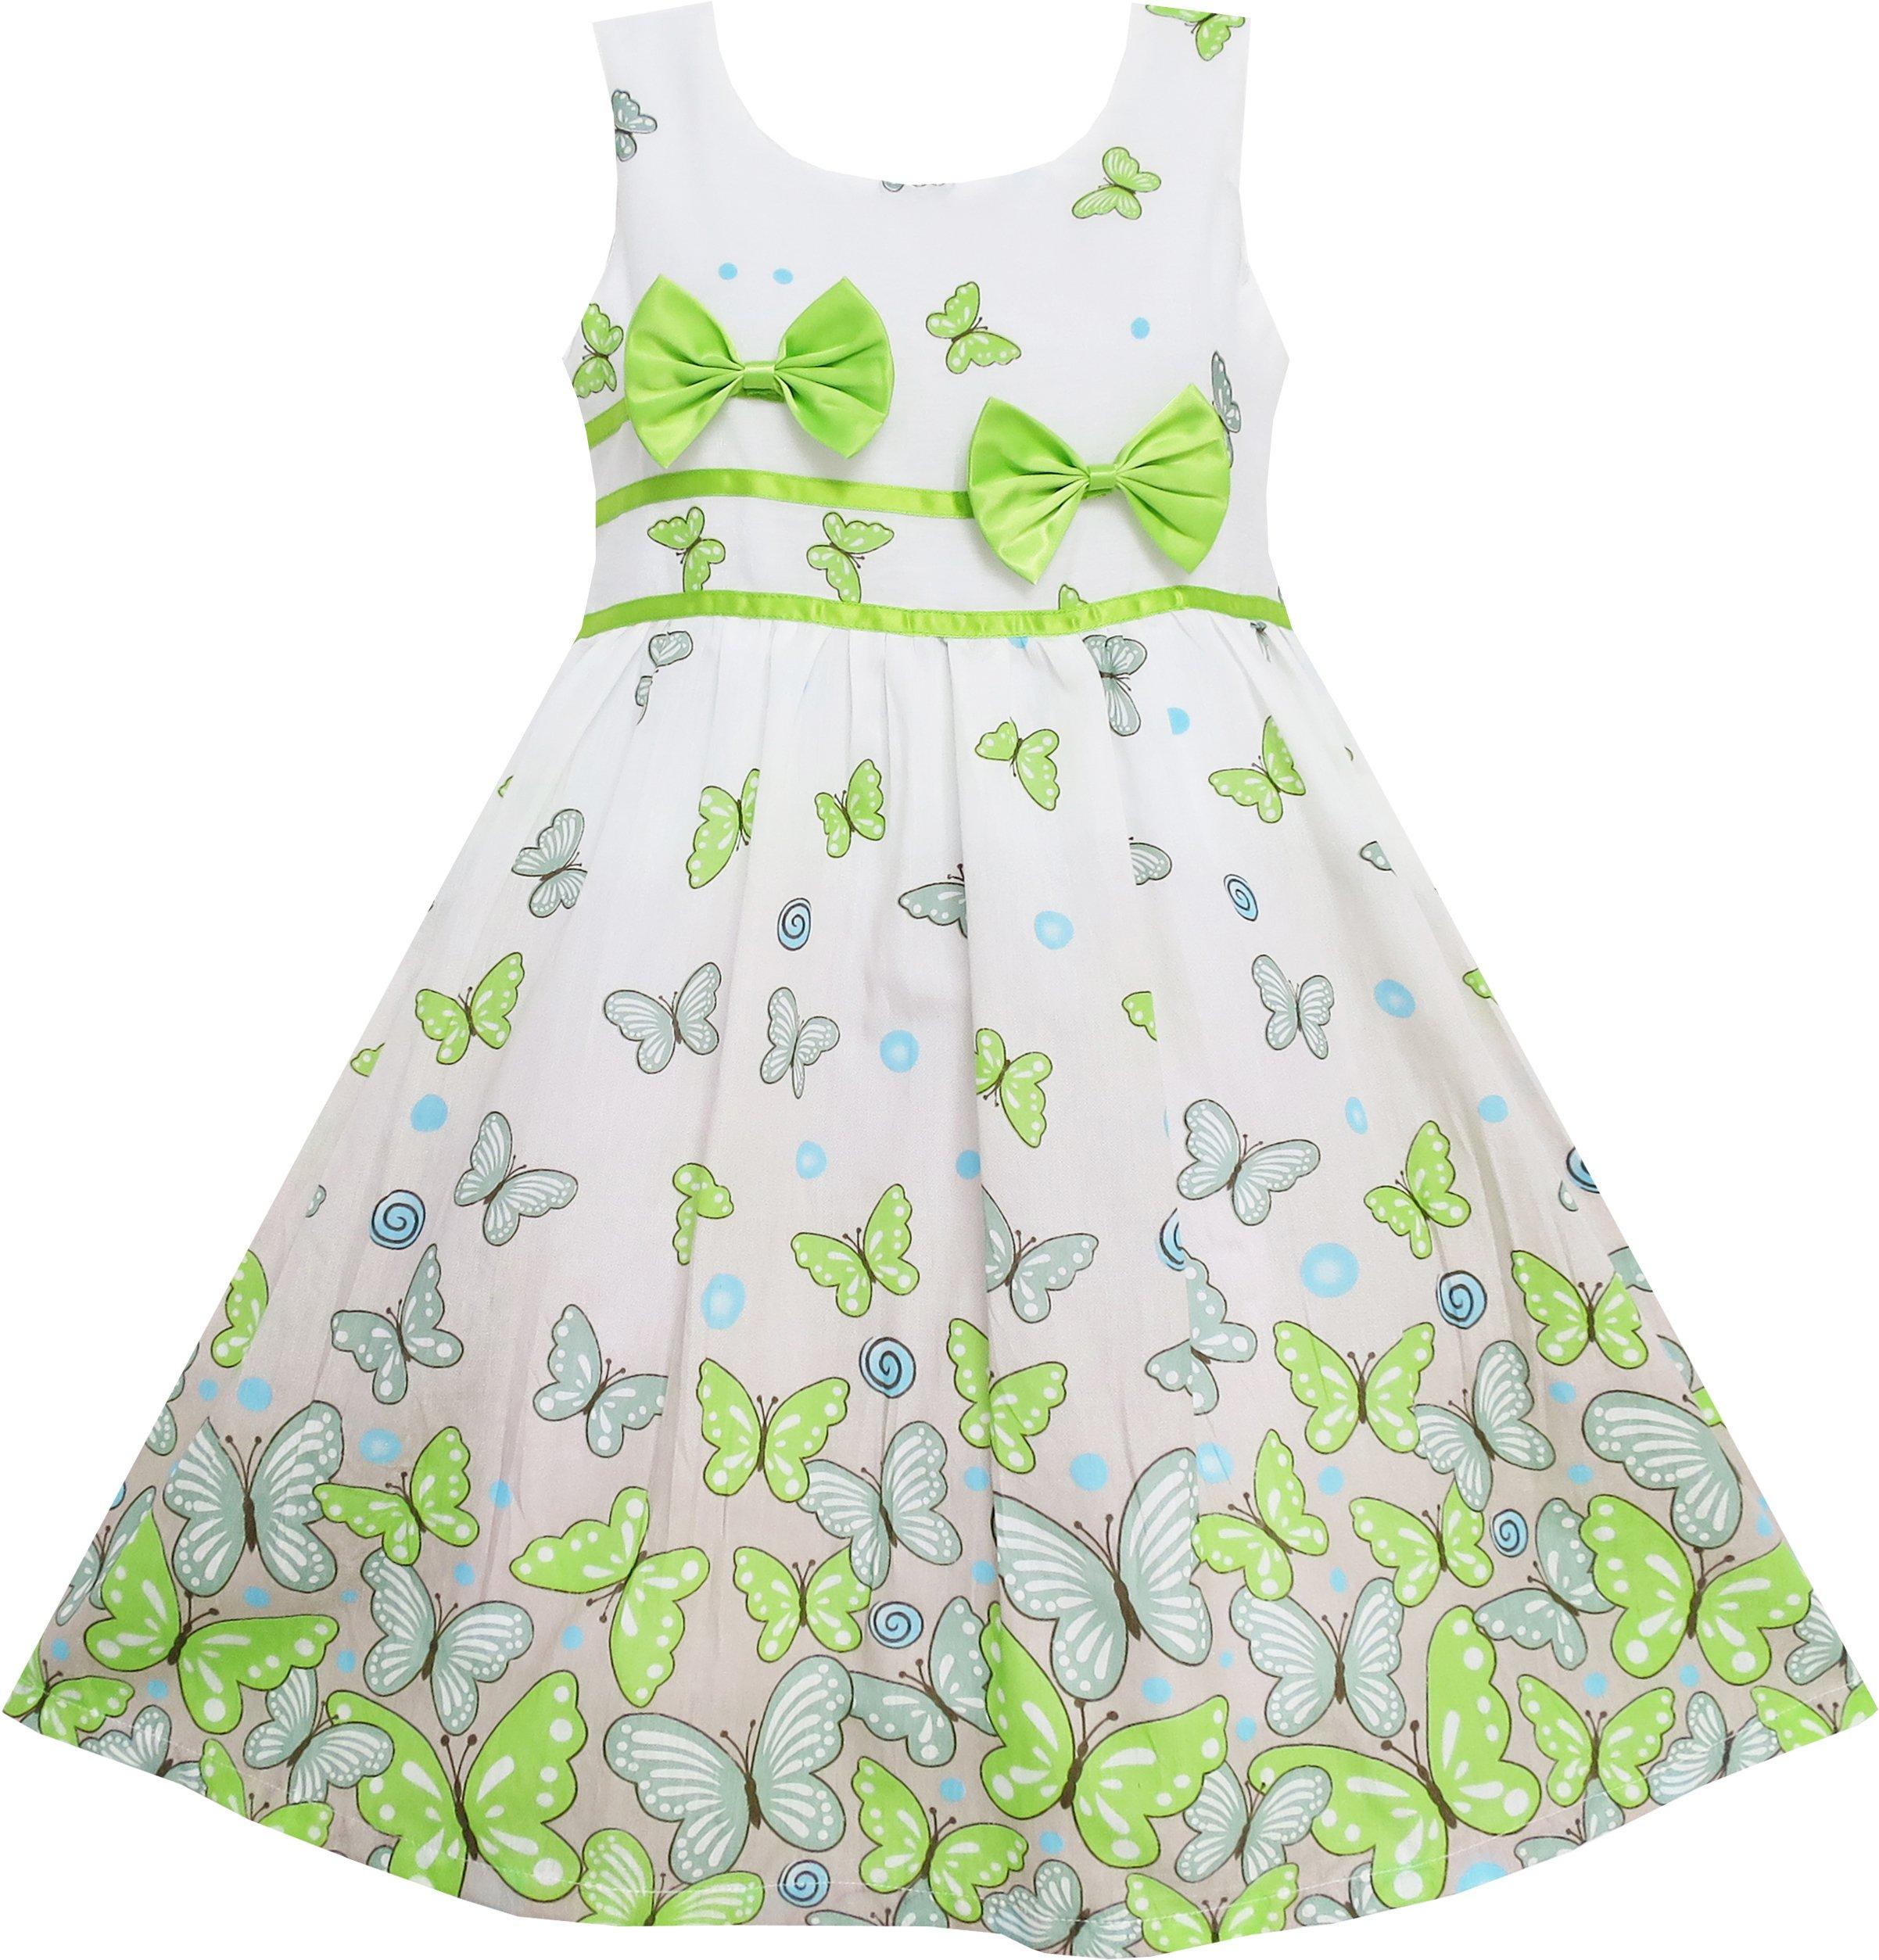 EY63 Sunny Fashion Big Girls' Dress Butterfly Green Double Bow Tie Summer Beach 7-8